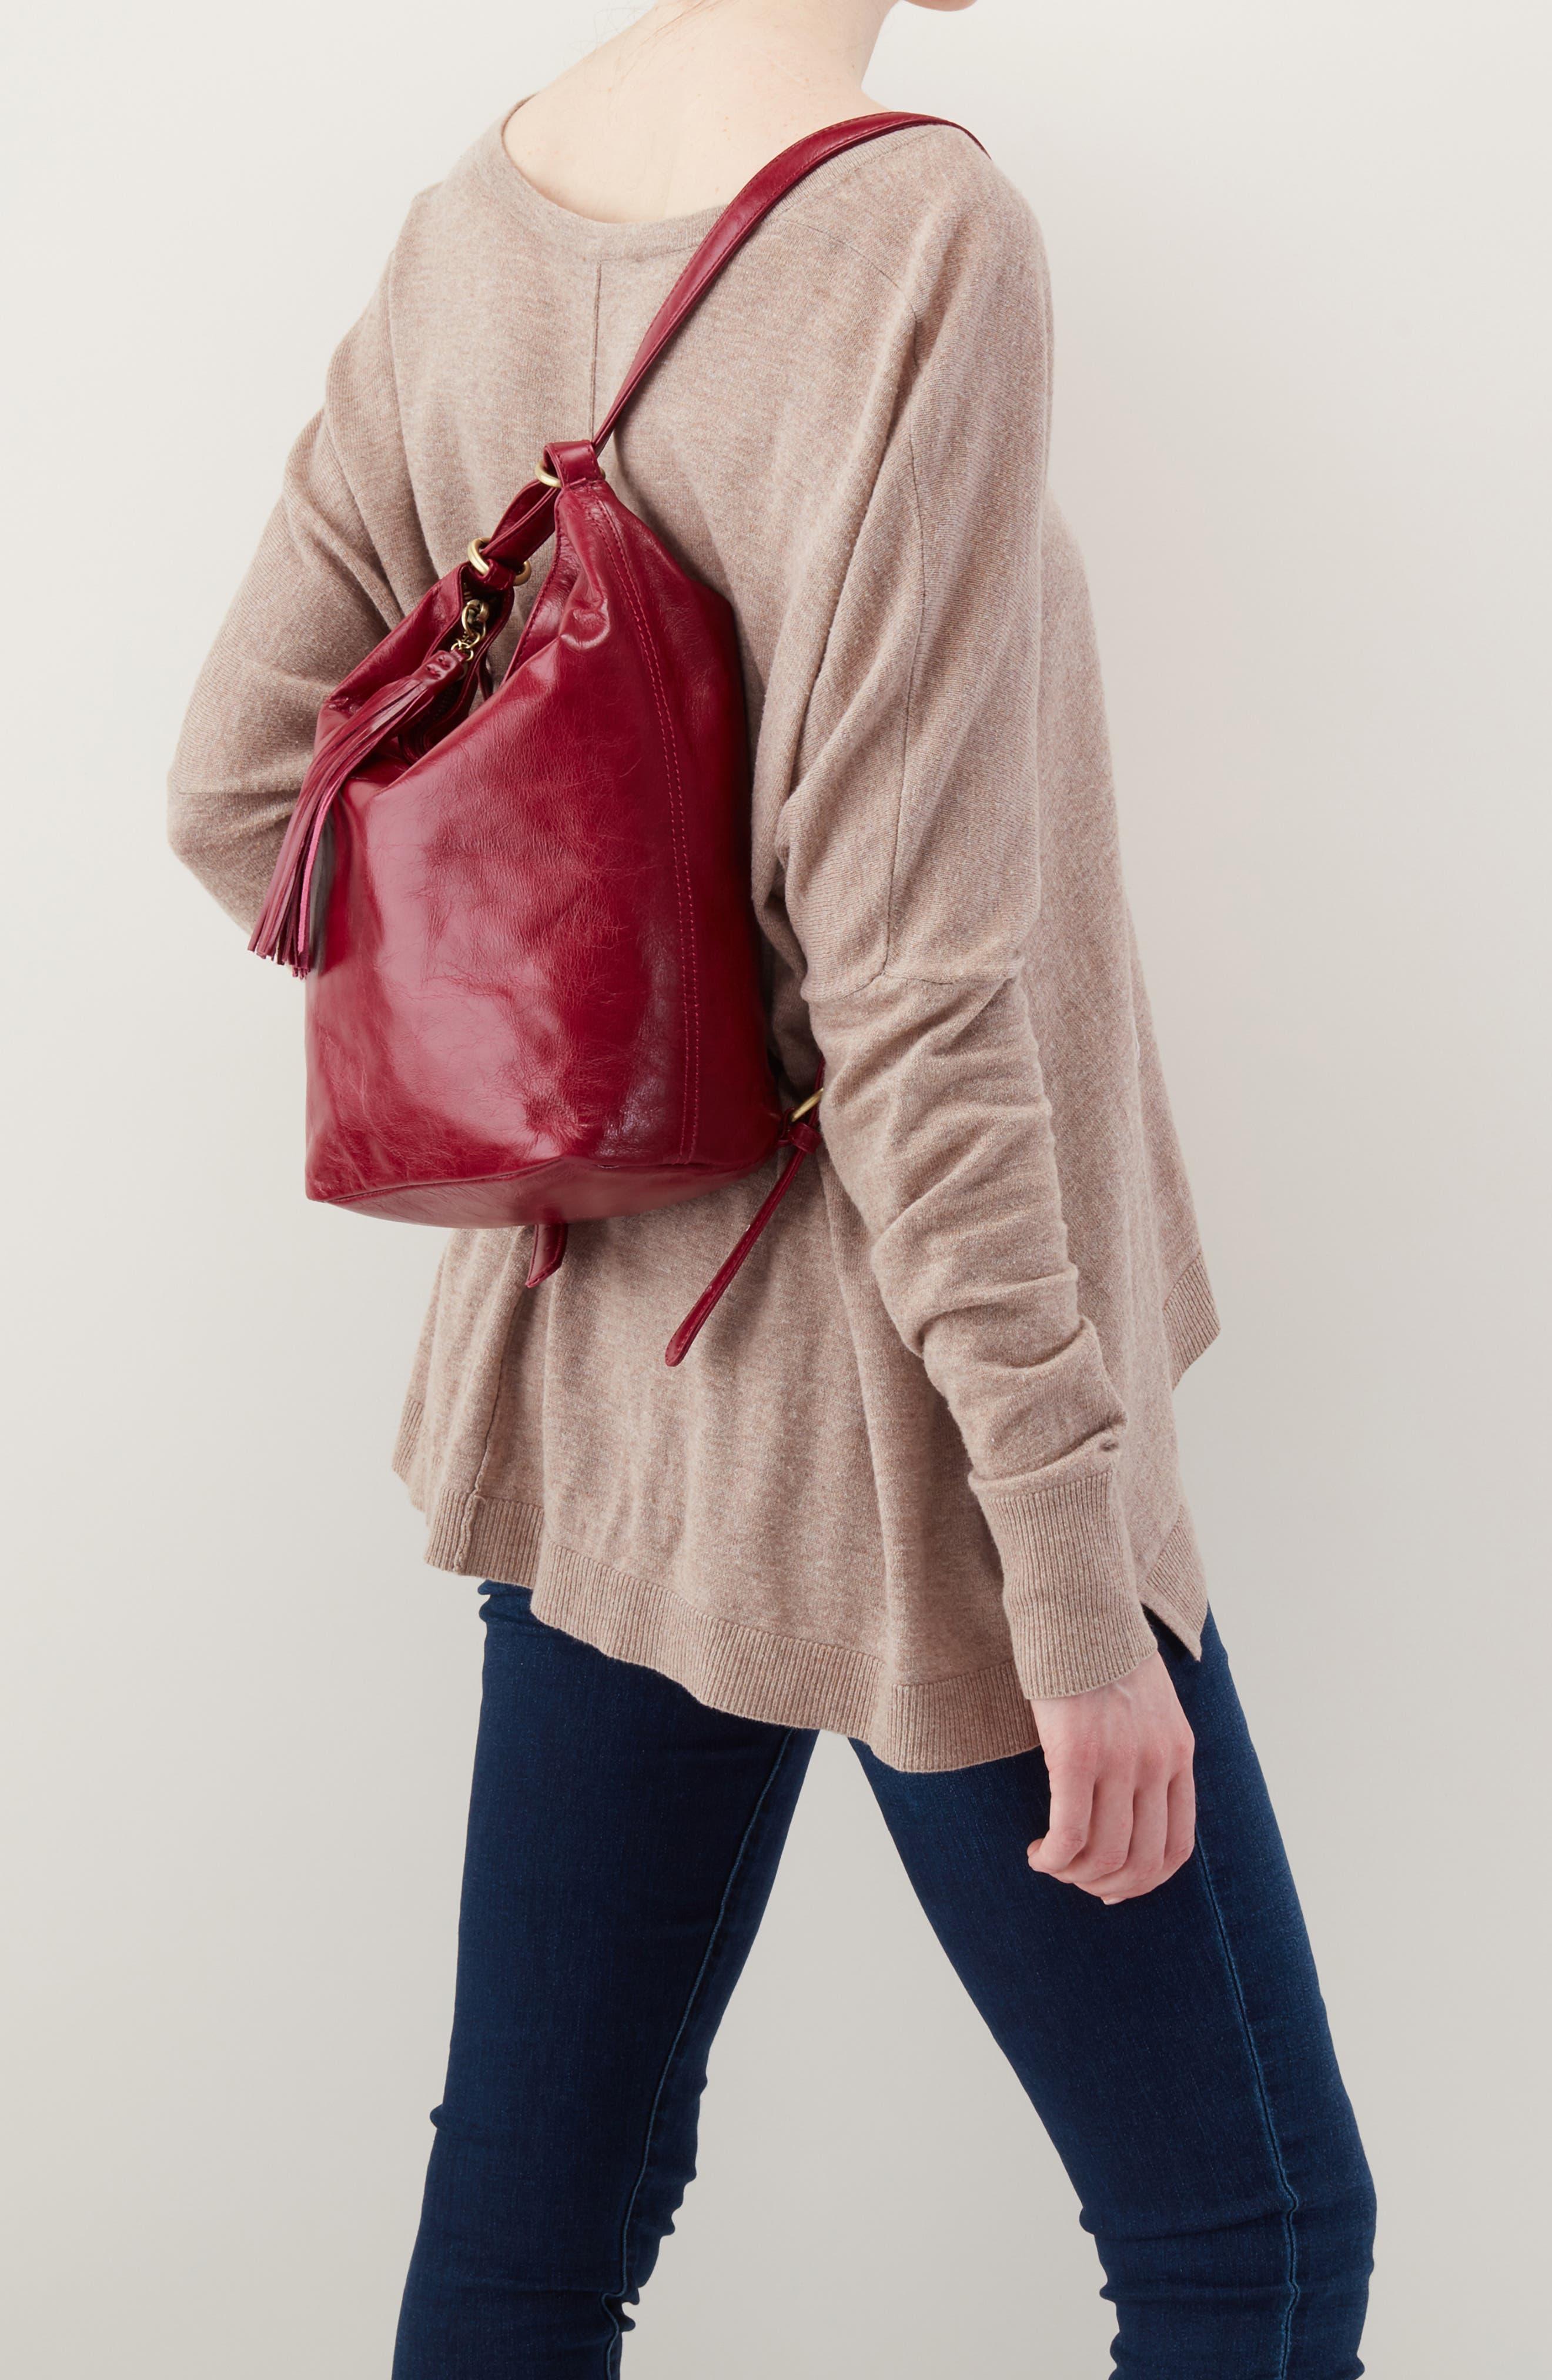 Blaze Convertible Shoulder Bag,                             Alternate thumbnail 2, color,                             RUBY